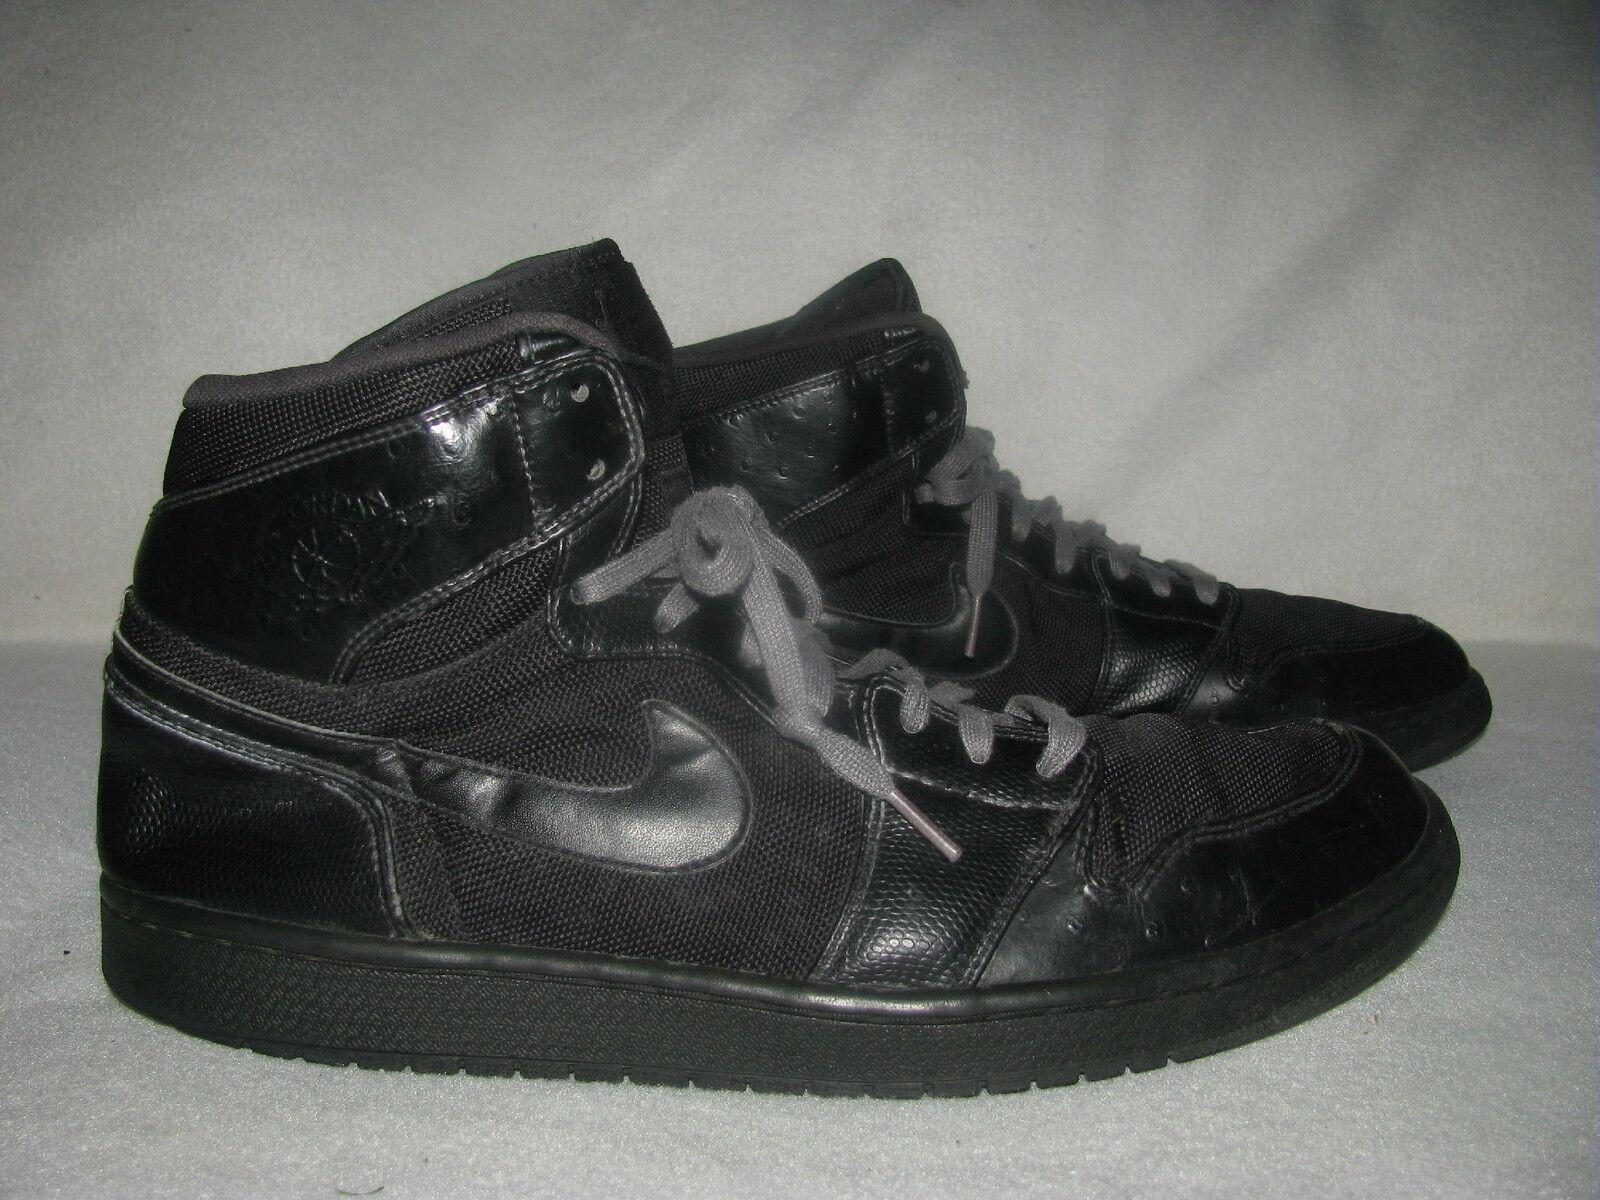 Nike Air Jordan 1 Retro Alta Negro 332550002 para Hombre Antracita Zapatillas 332550002 Negro 6ce091